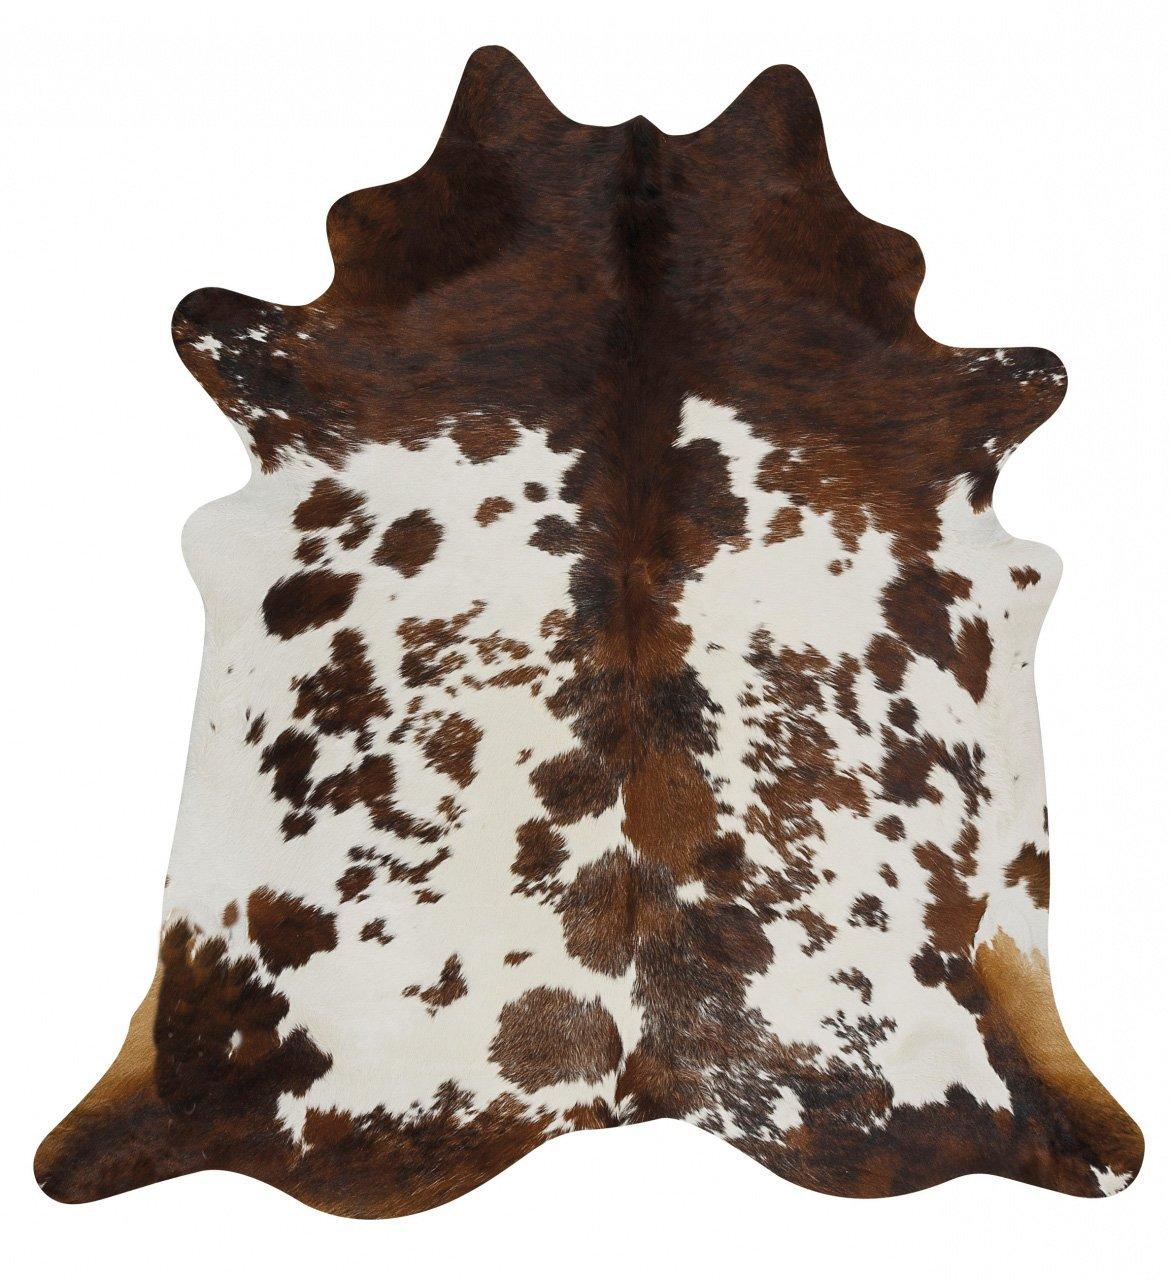 Exquisite Natural Cow Hide Zebra Print Rug